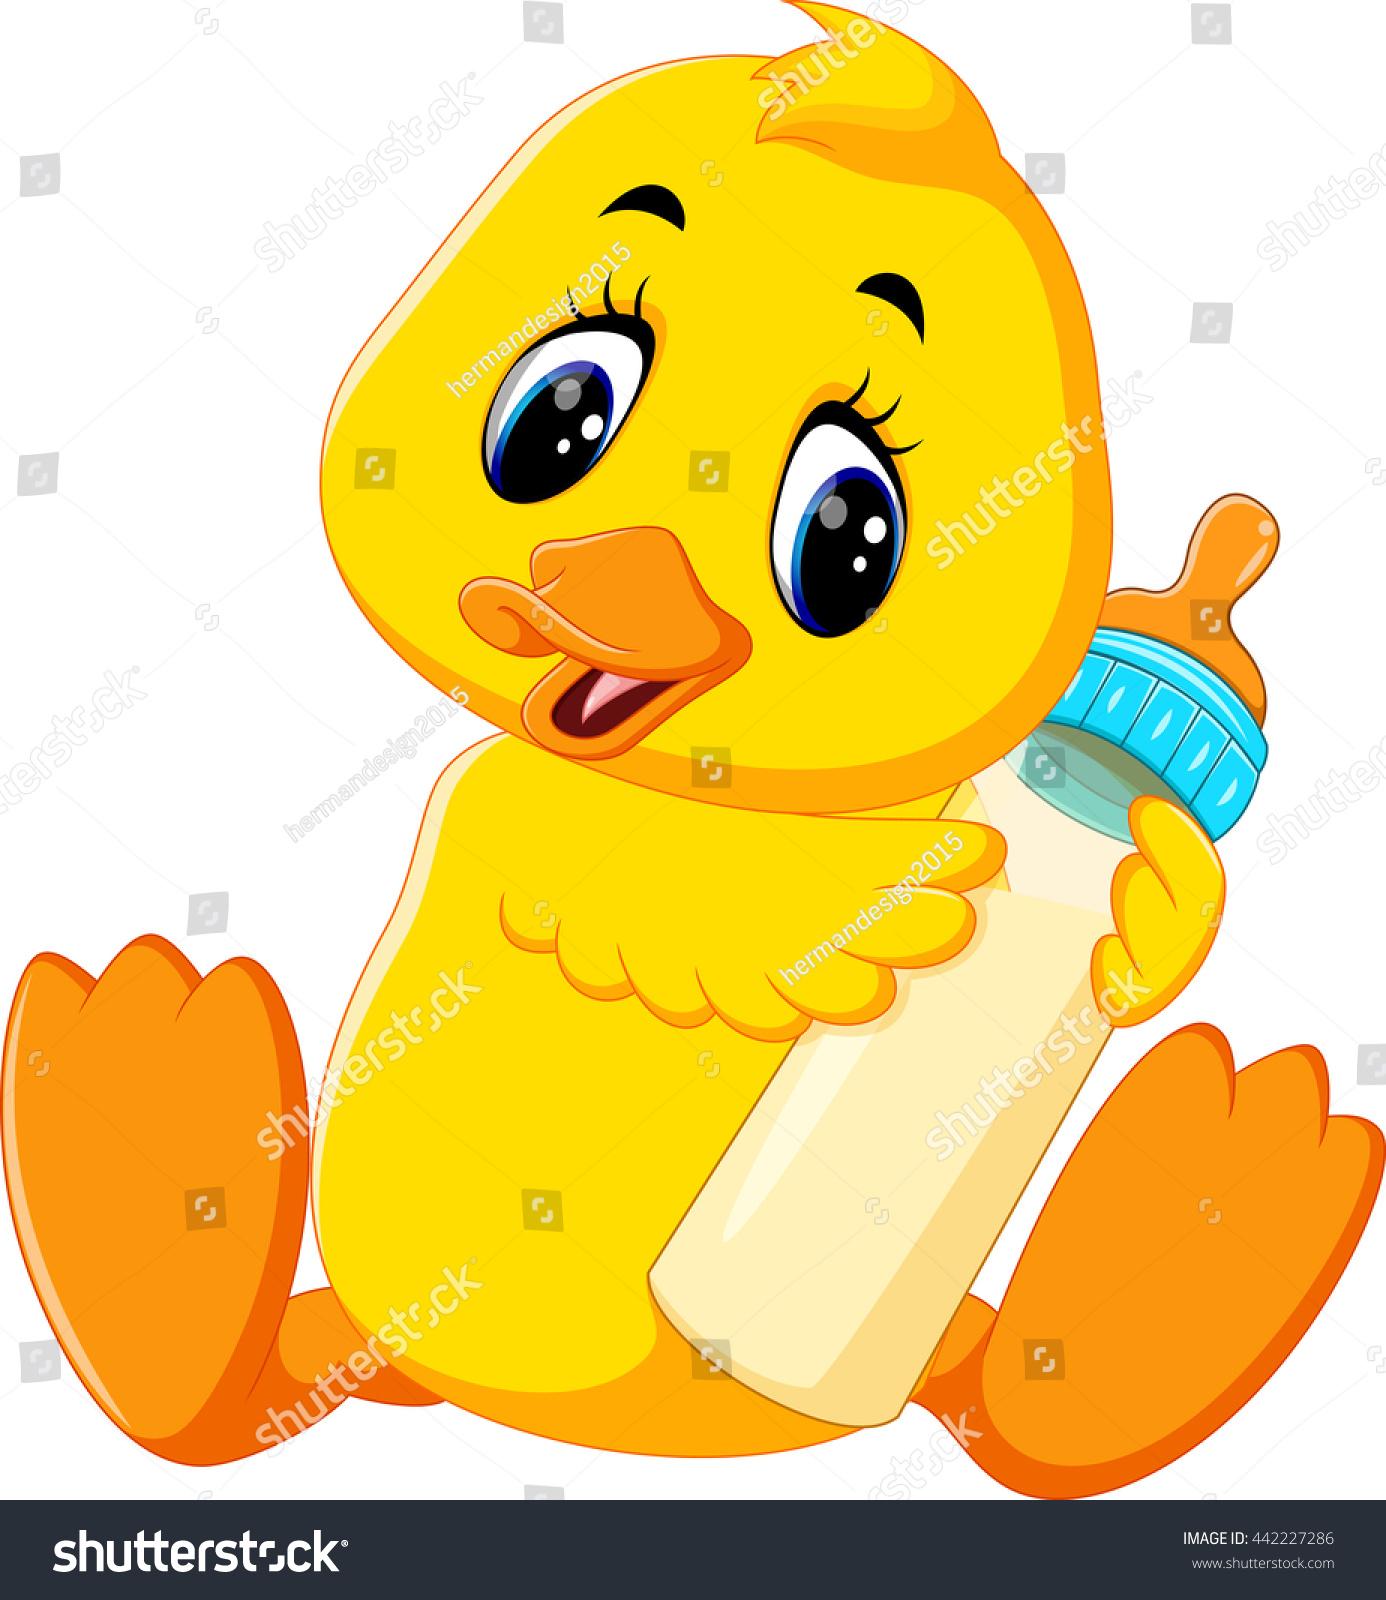 Cute cartoon rubber duck